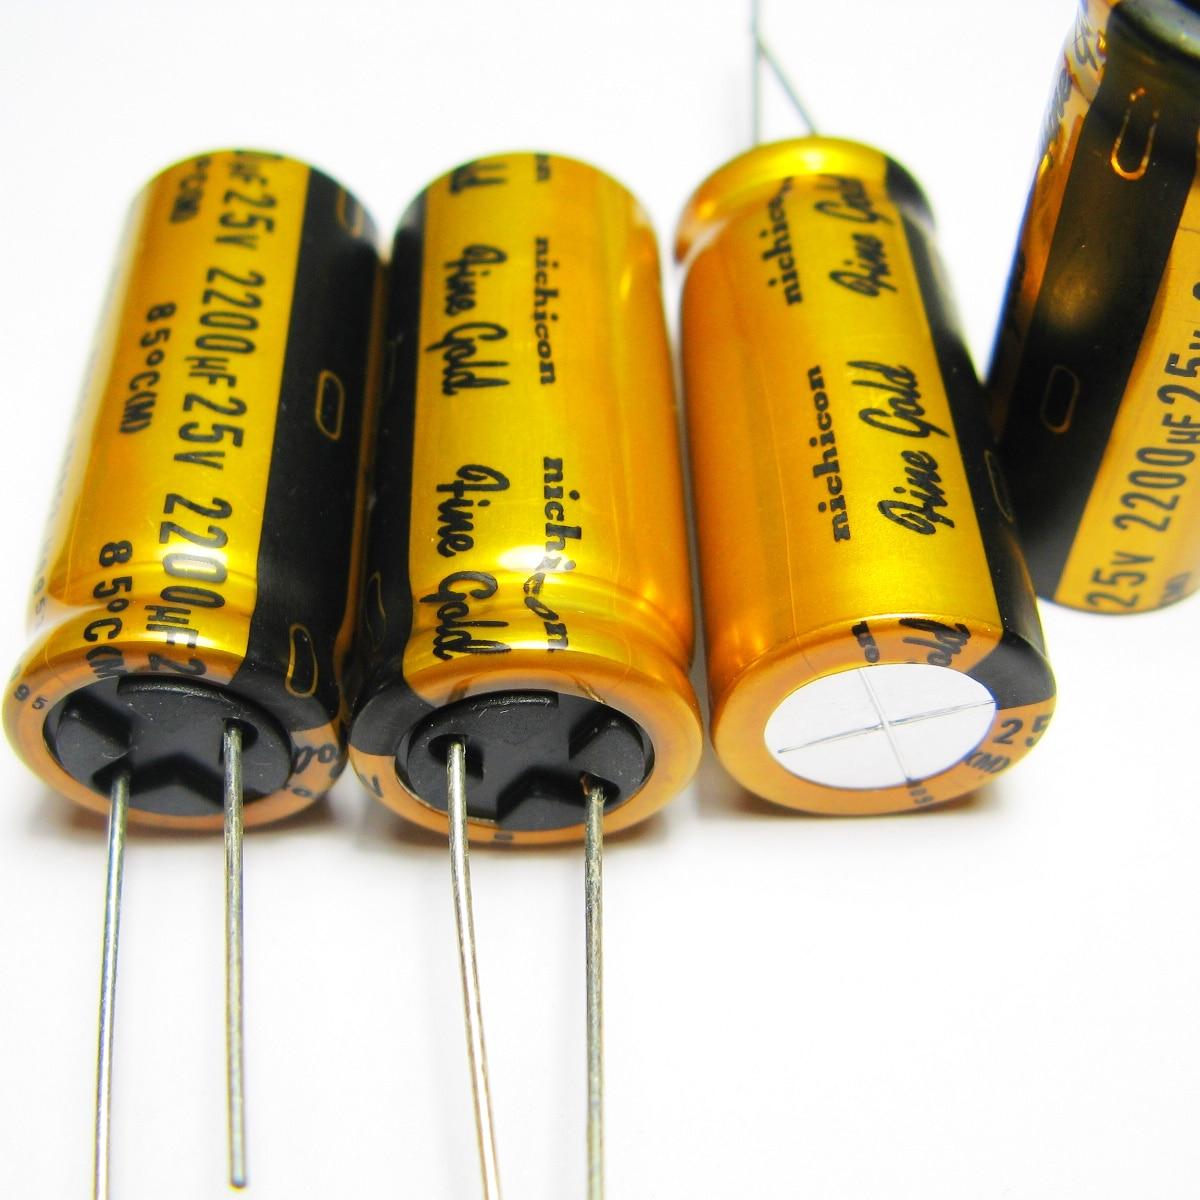 5pcs/10pcs original Japan NICHICON FG 25v2200uf condenser for audio super capacitor electrolytic capacitors free shipping-in Capacitors from Electronic Components & Supplies